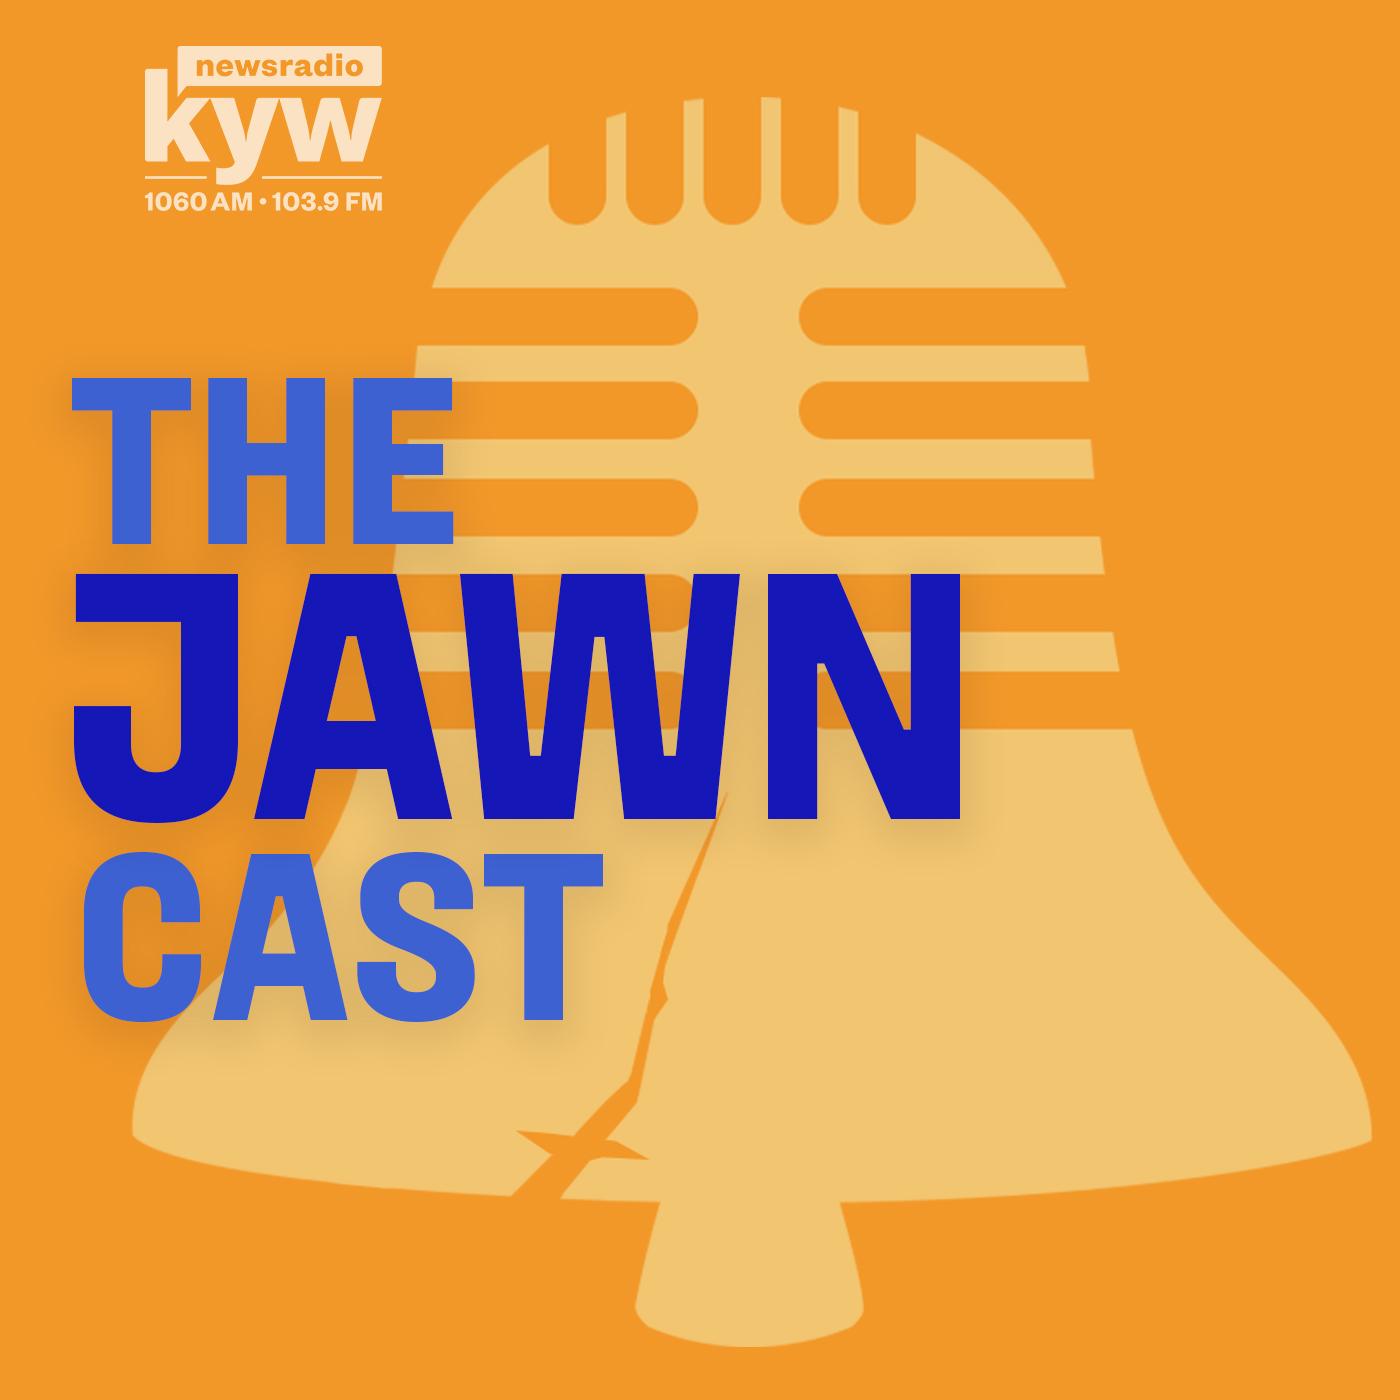 The Rundown from KYW Newsradio